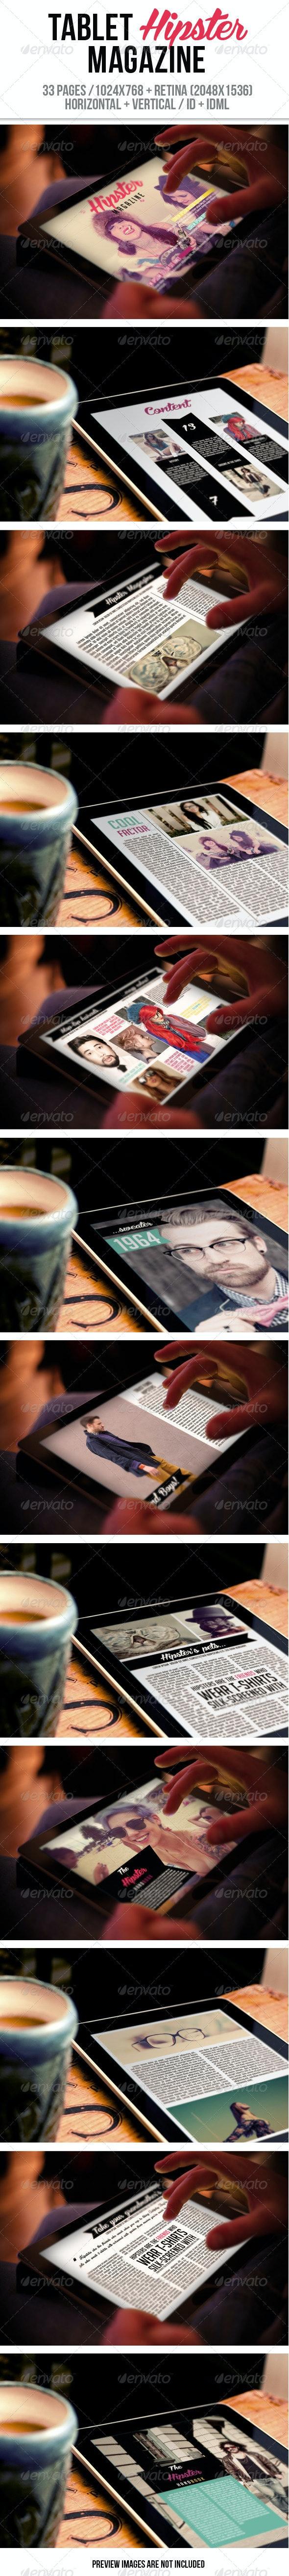 iPad & Tablet Hipster Magazine